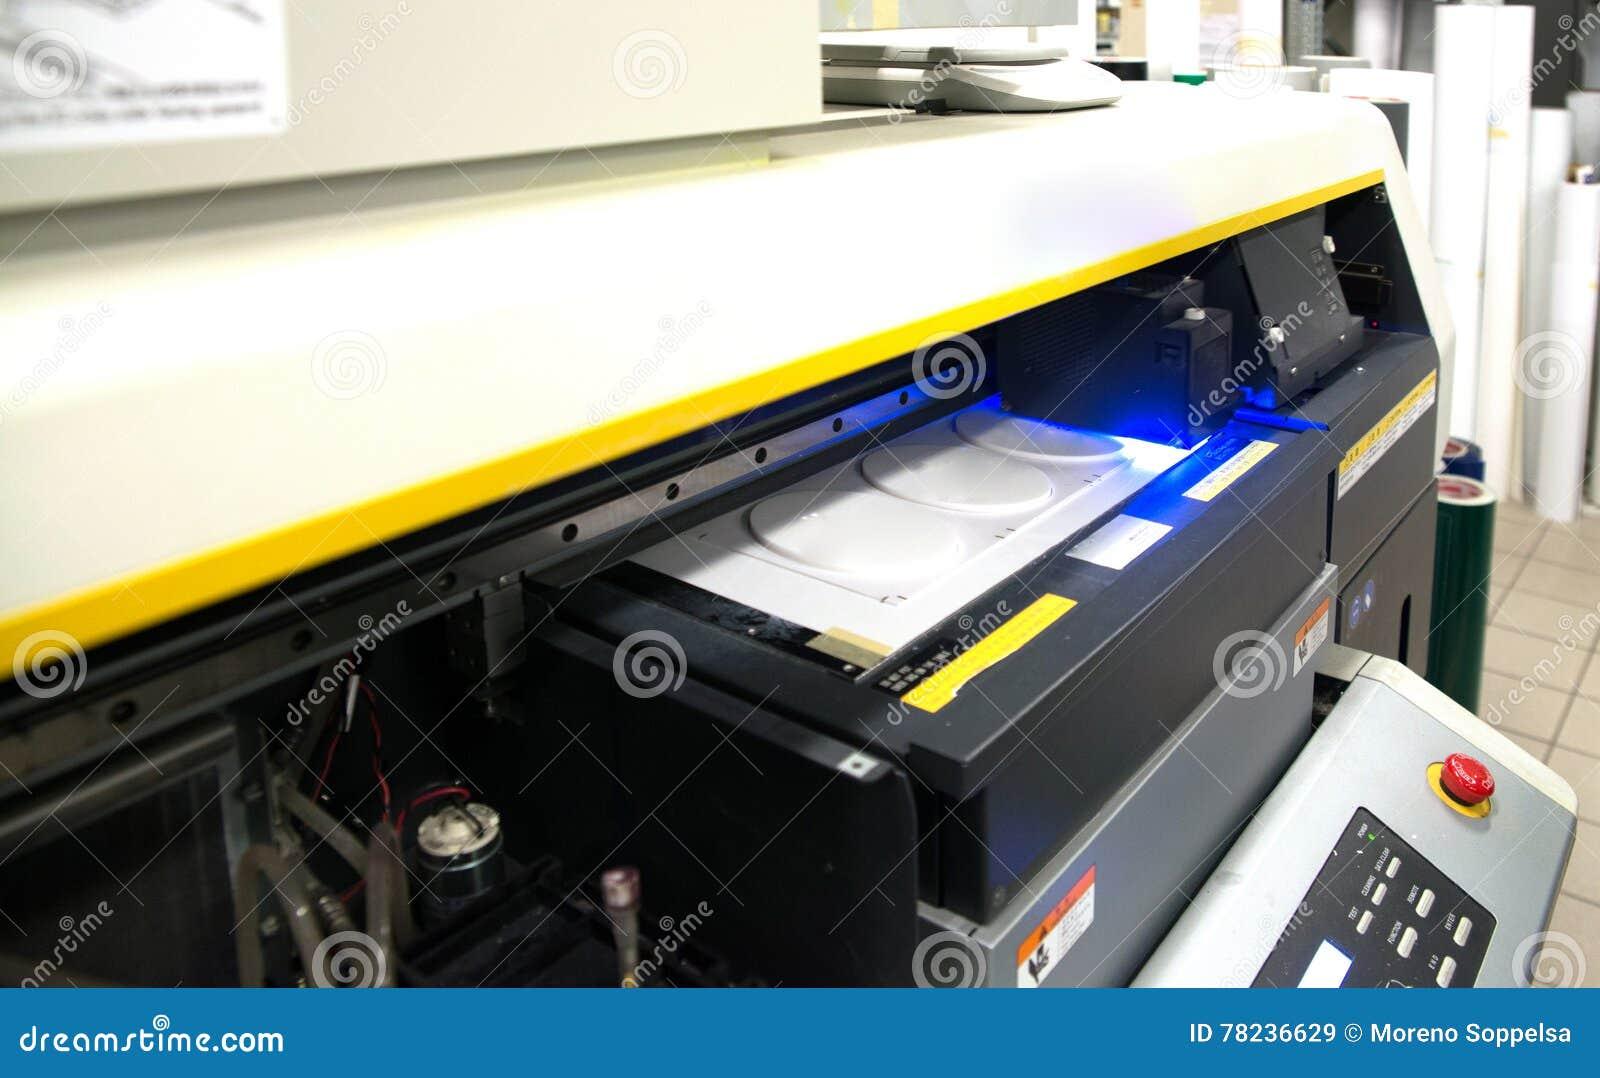 Digital Printing - Wide Format Printer Stock Image - Image of high